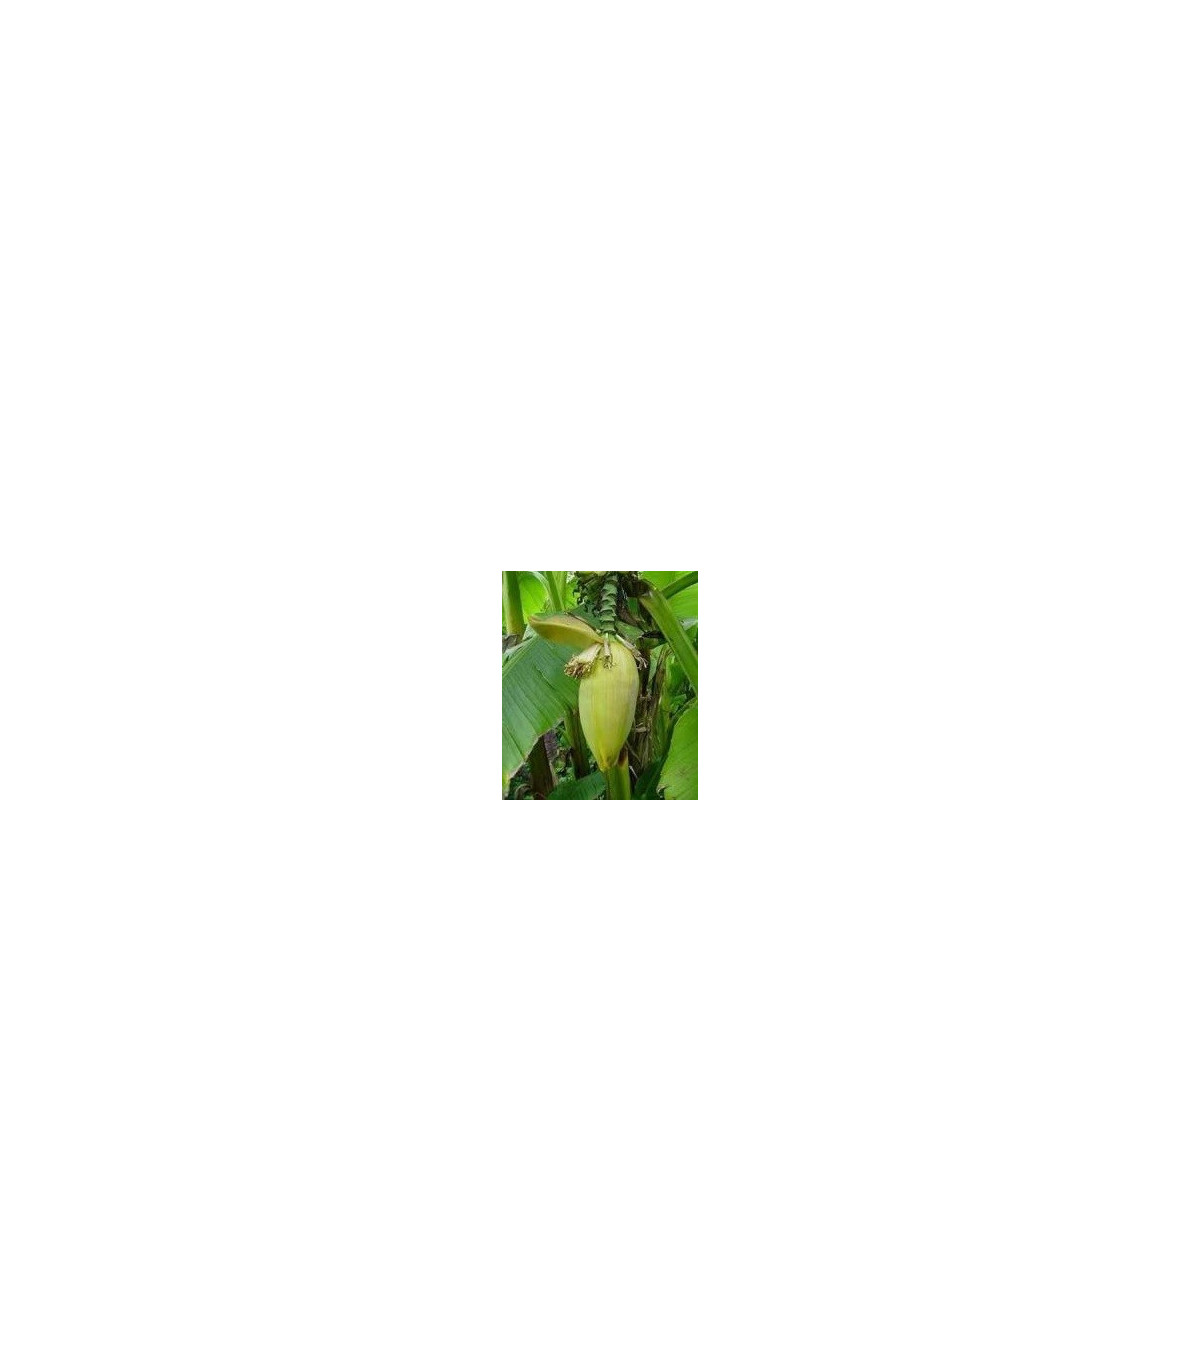 Banánovník Bau - Musa bauensis - semená banánovníka - semiačka - 3 ks